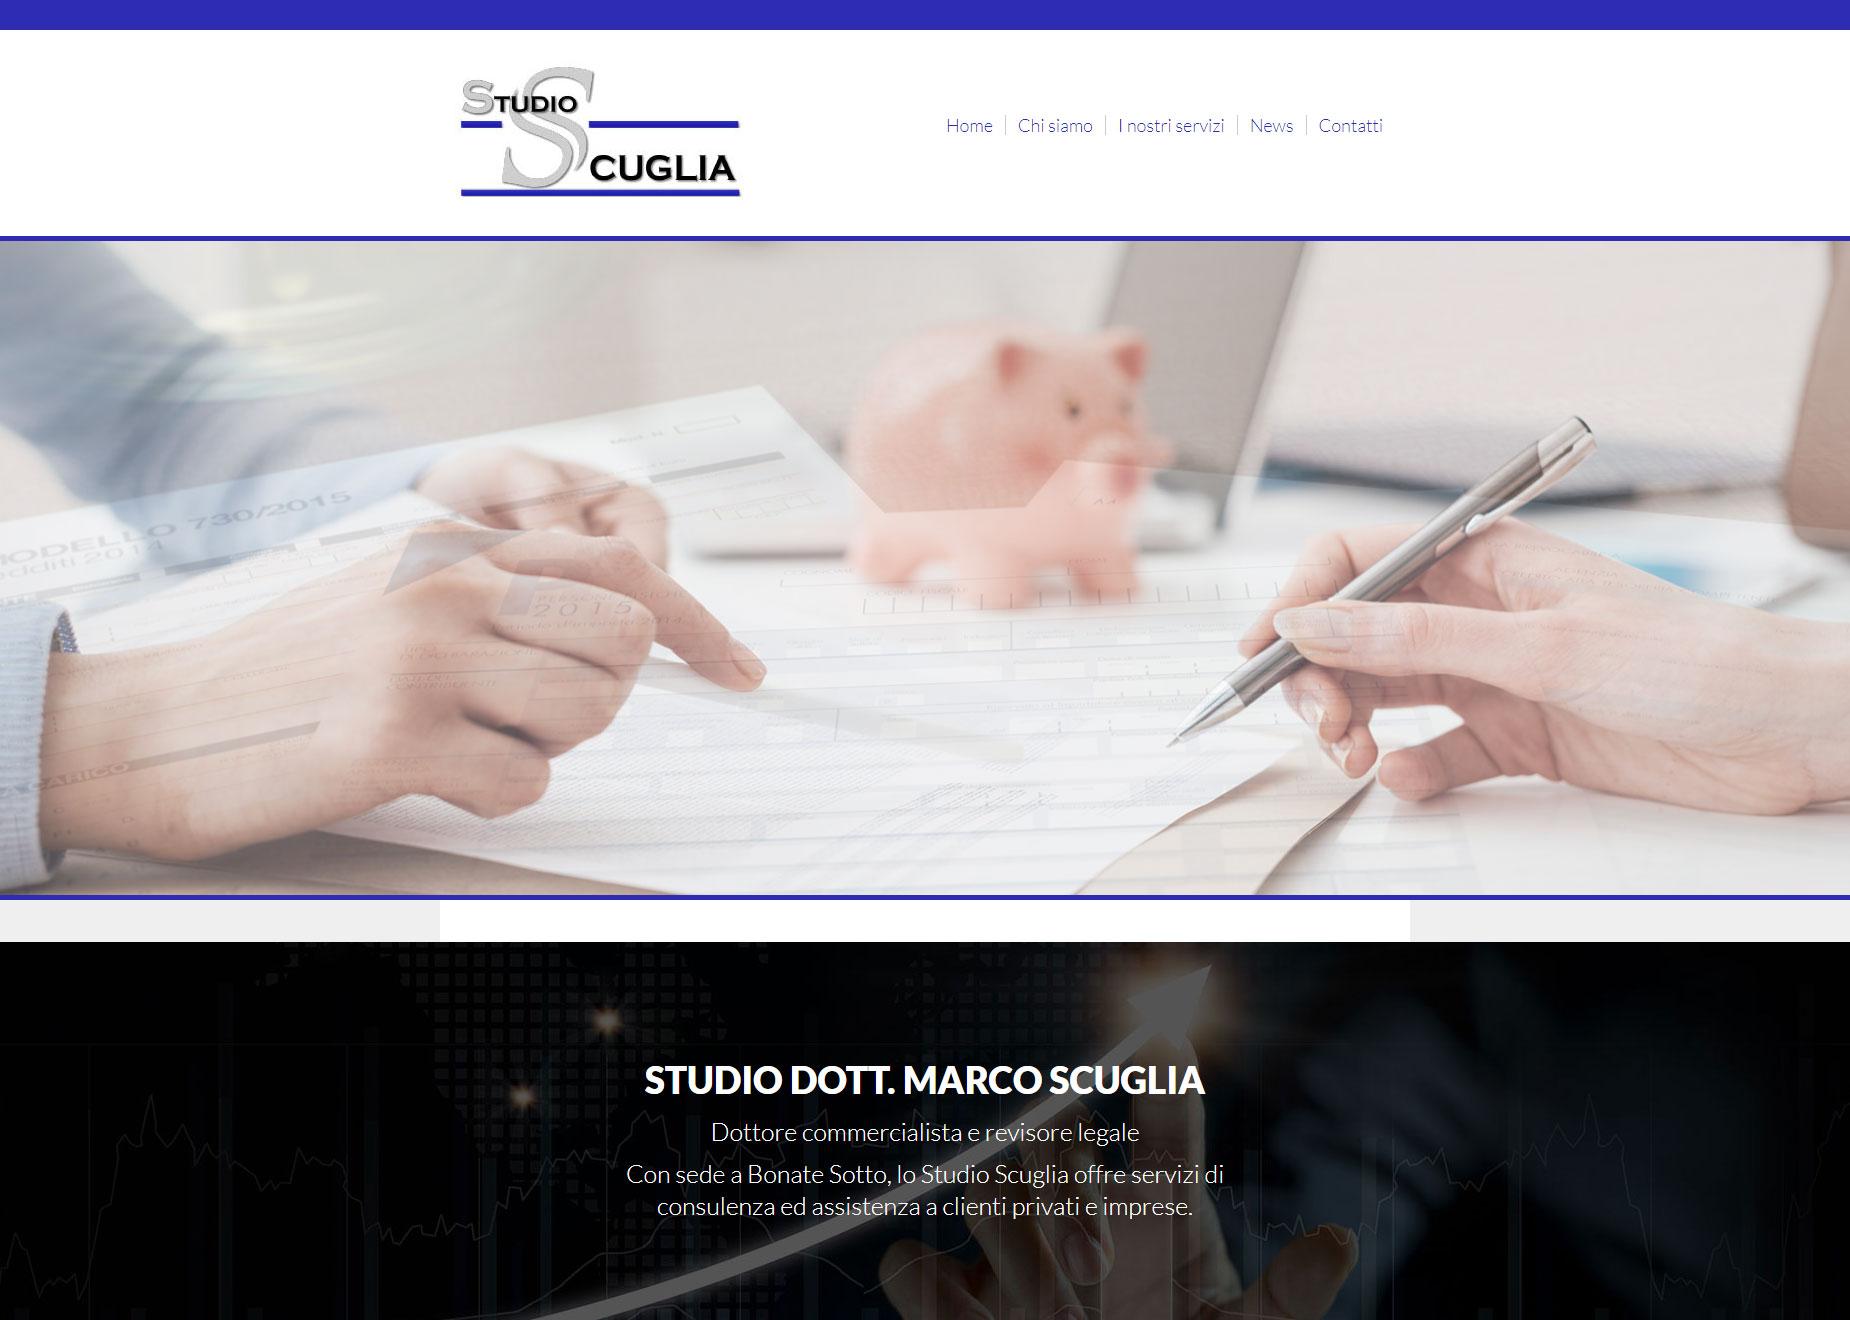 screencapture-studio-scuglia-it-2018-03-16-10_34_20